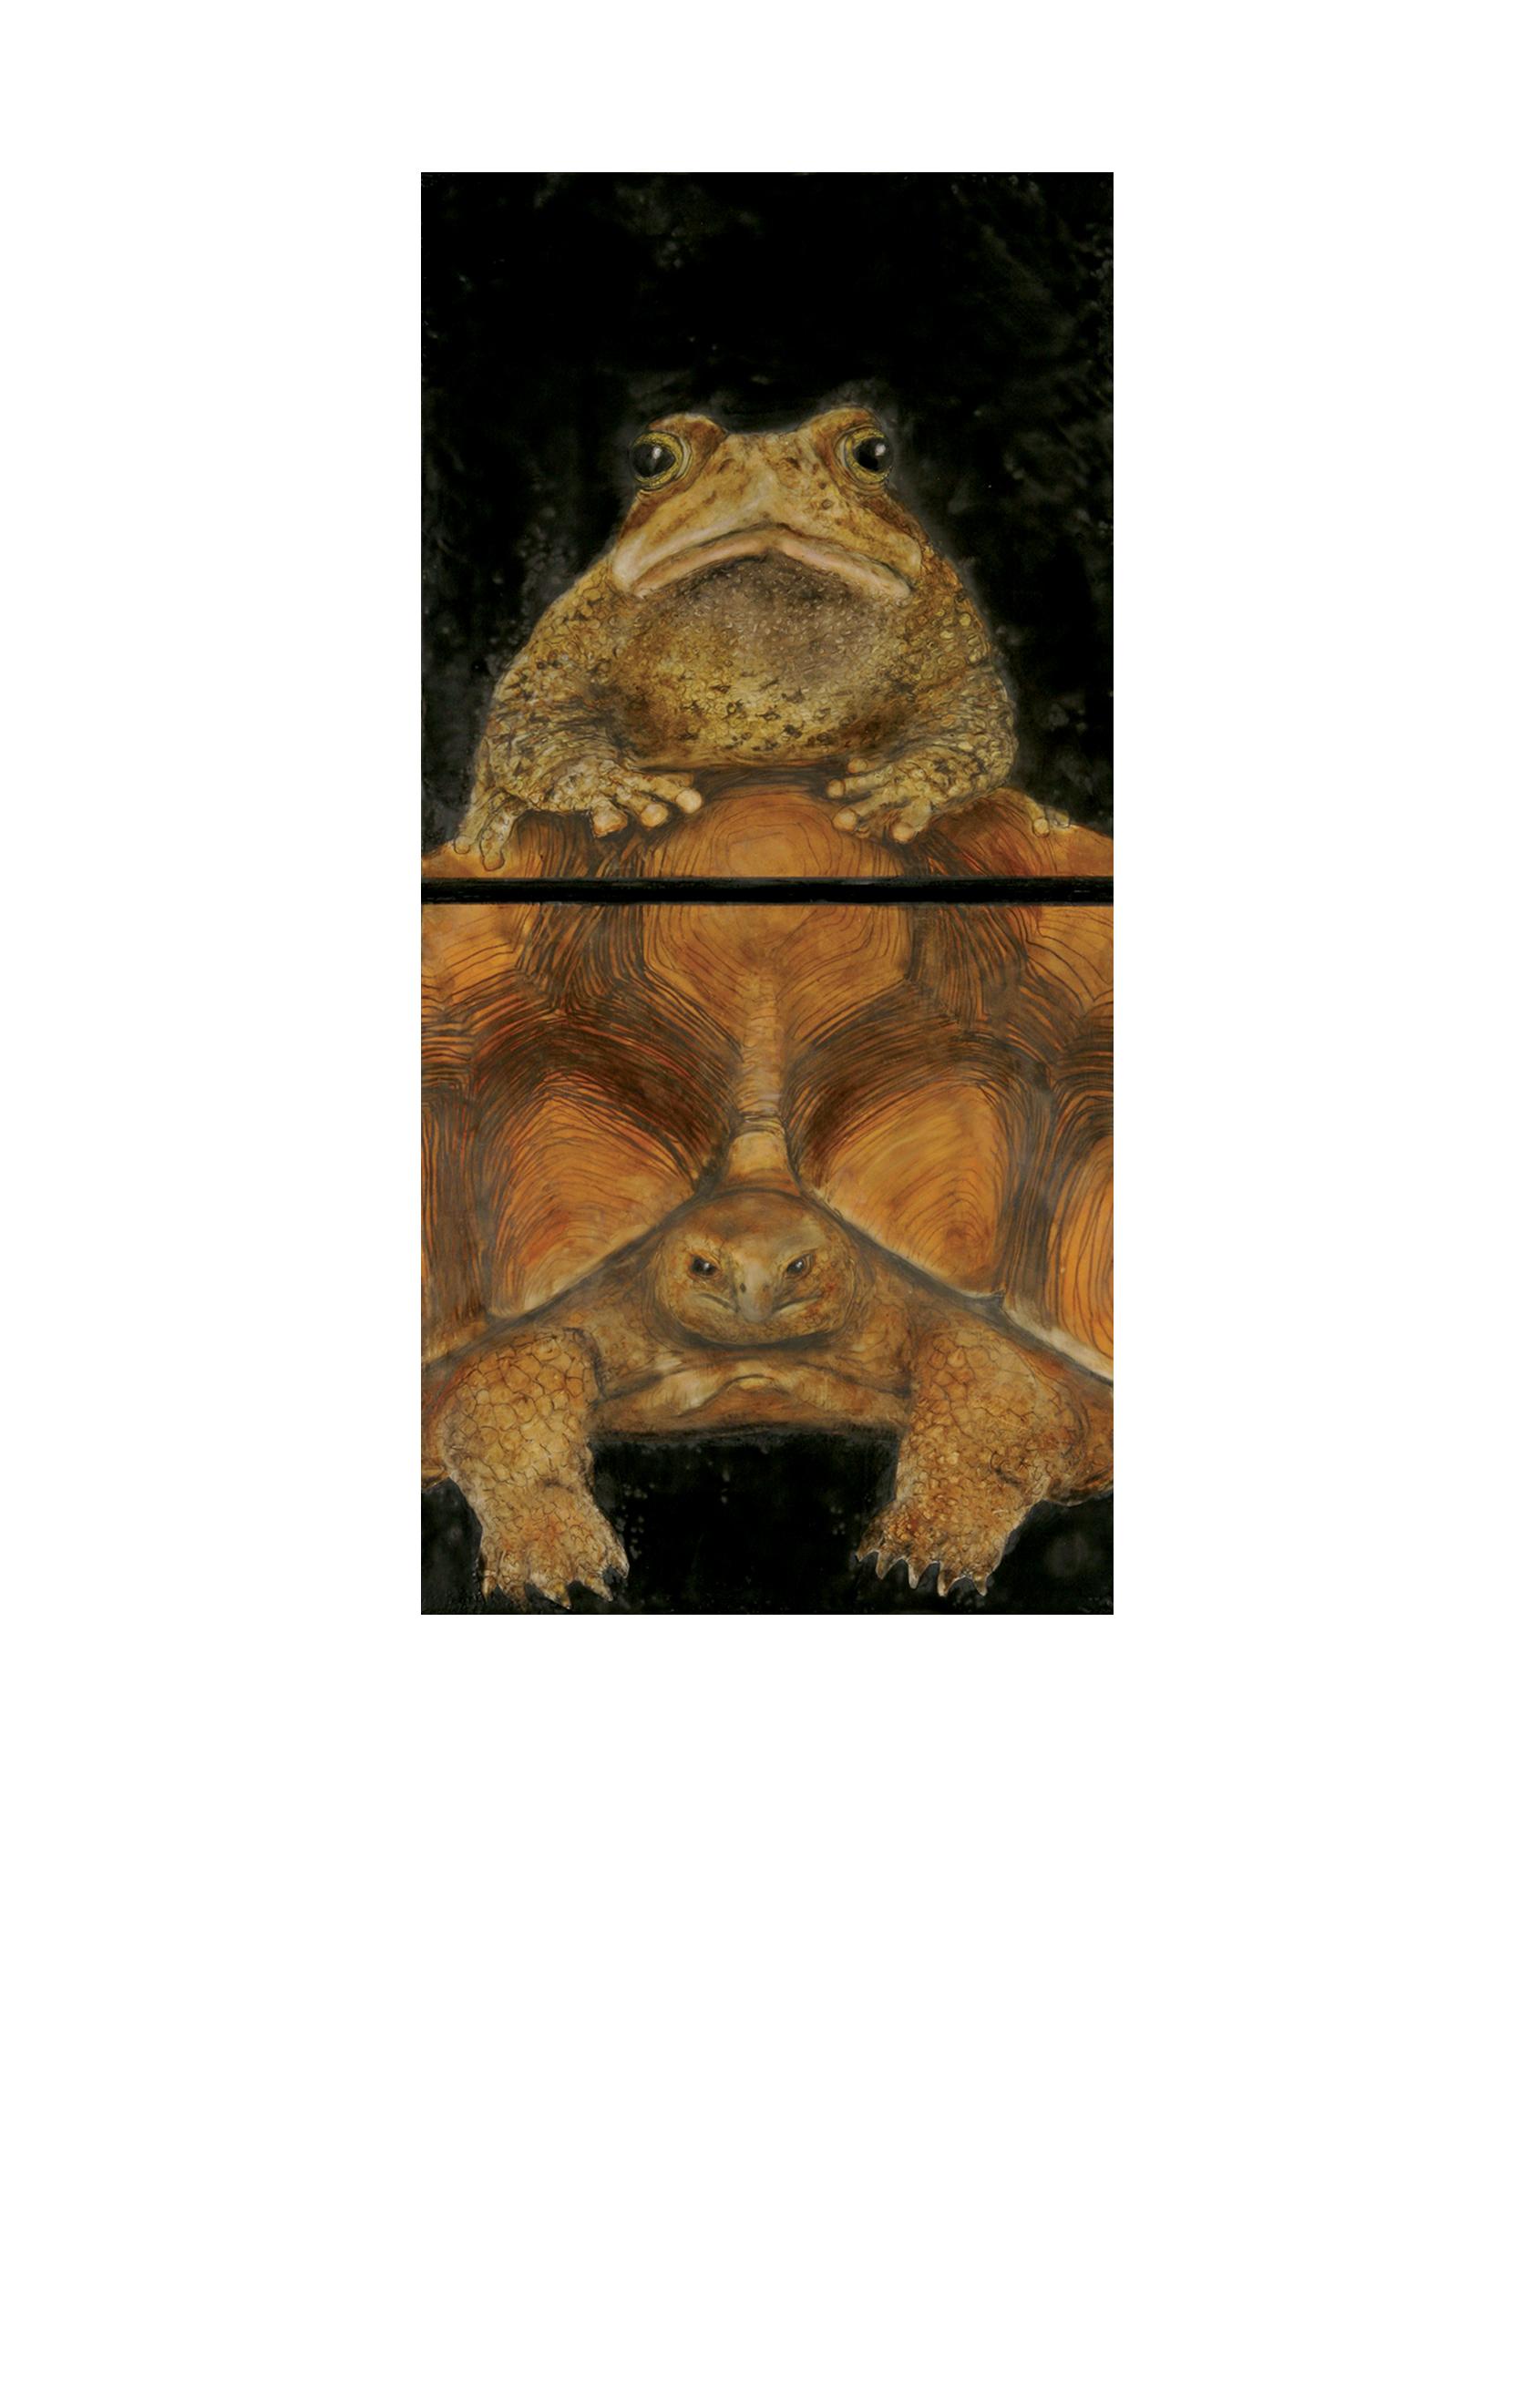 Toad & Tortoise